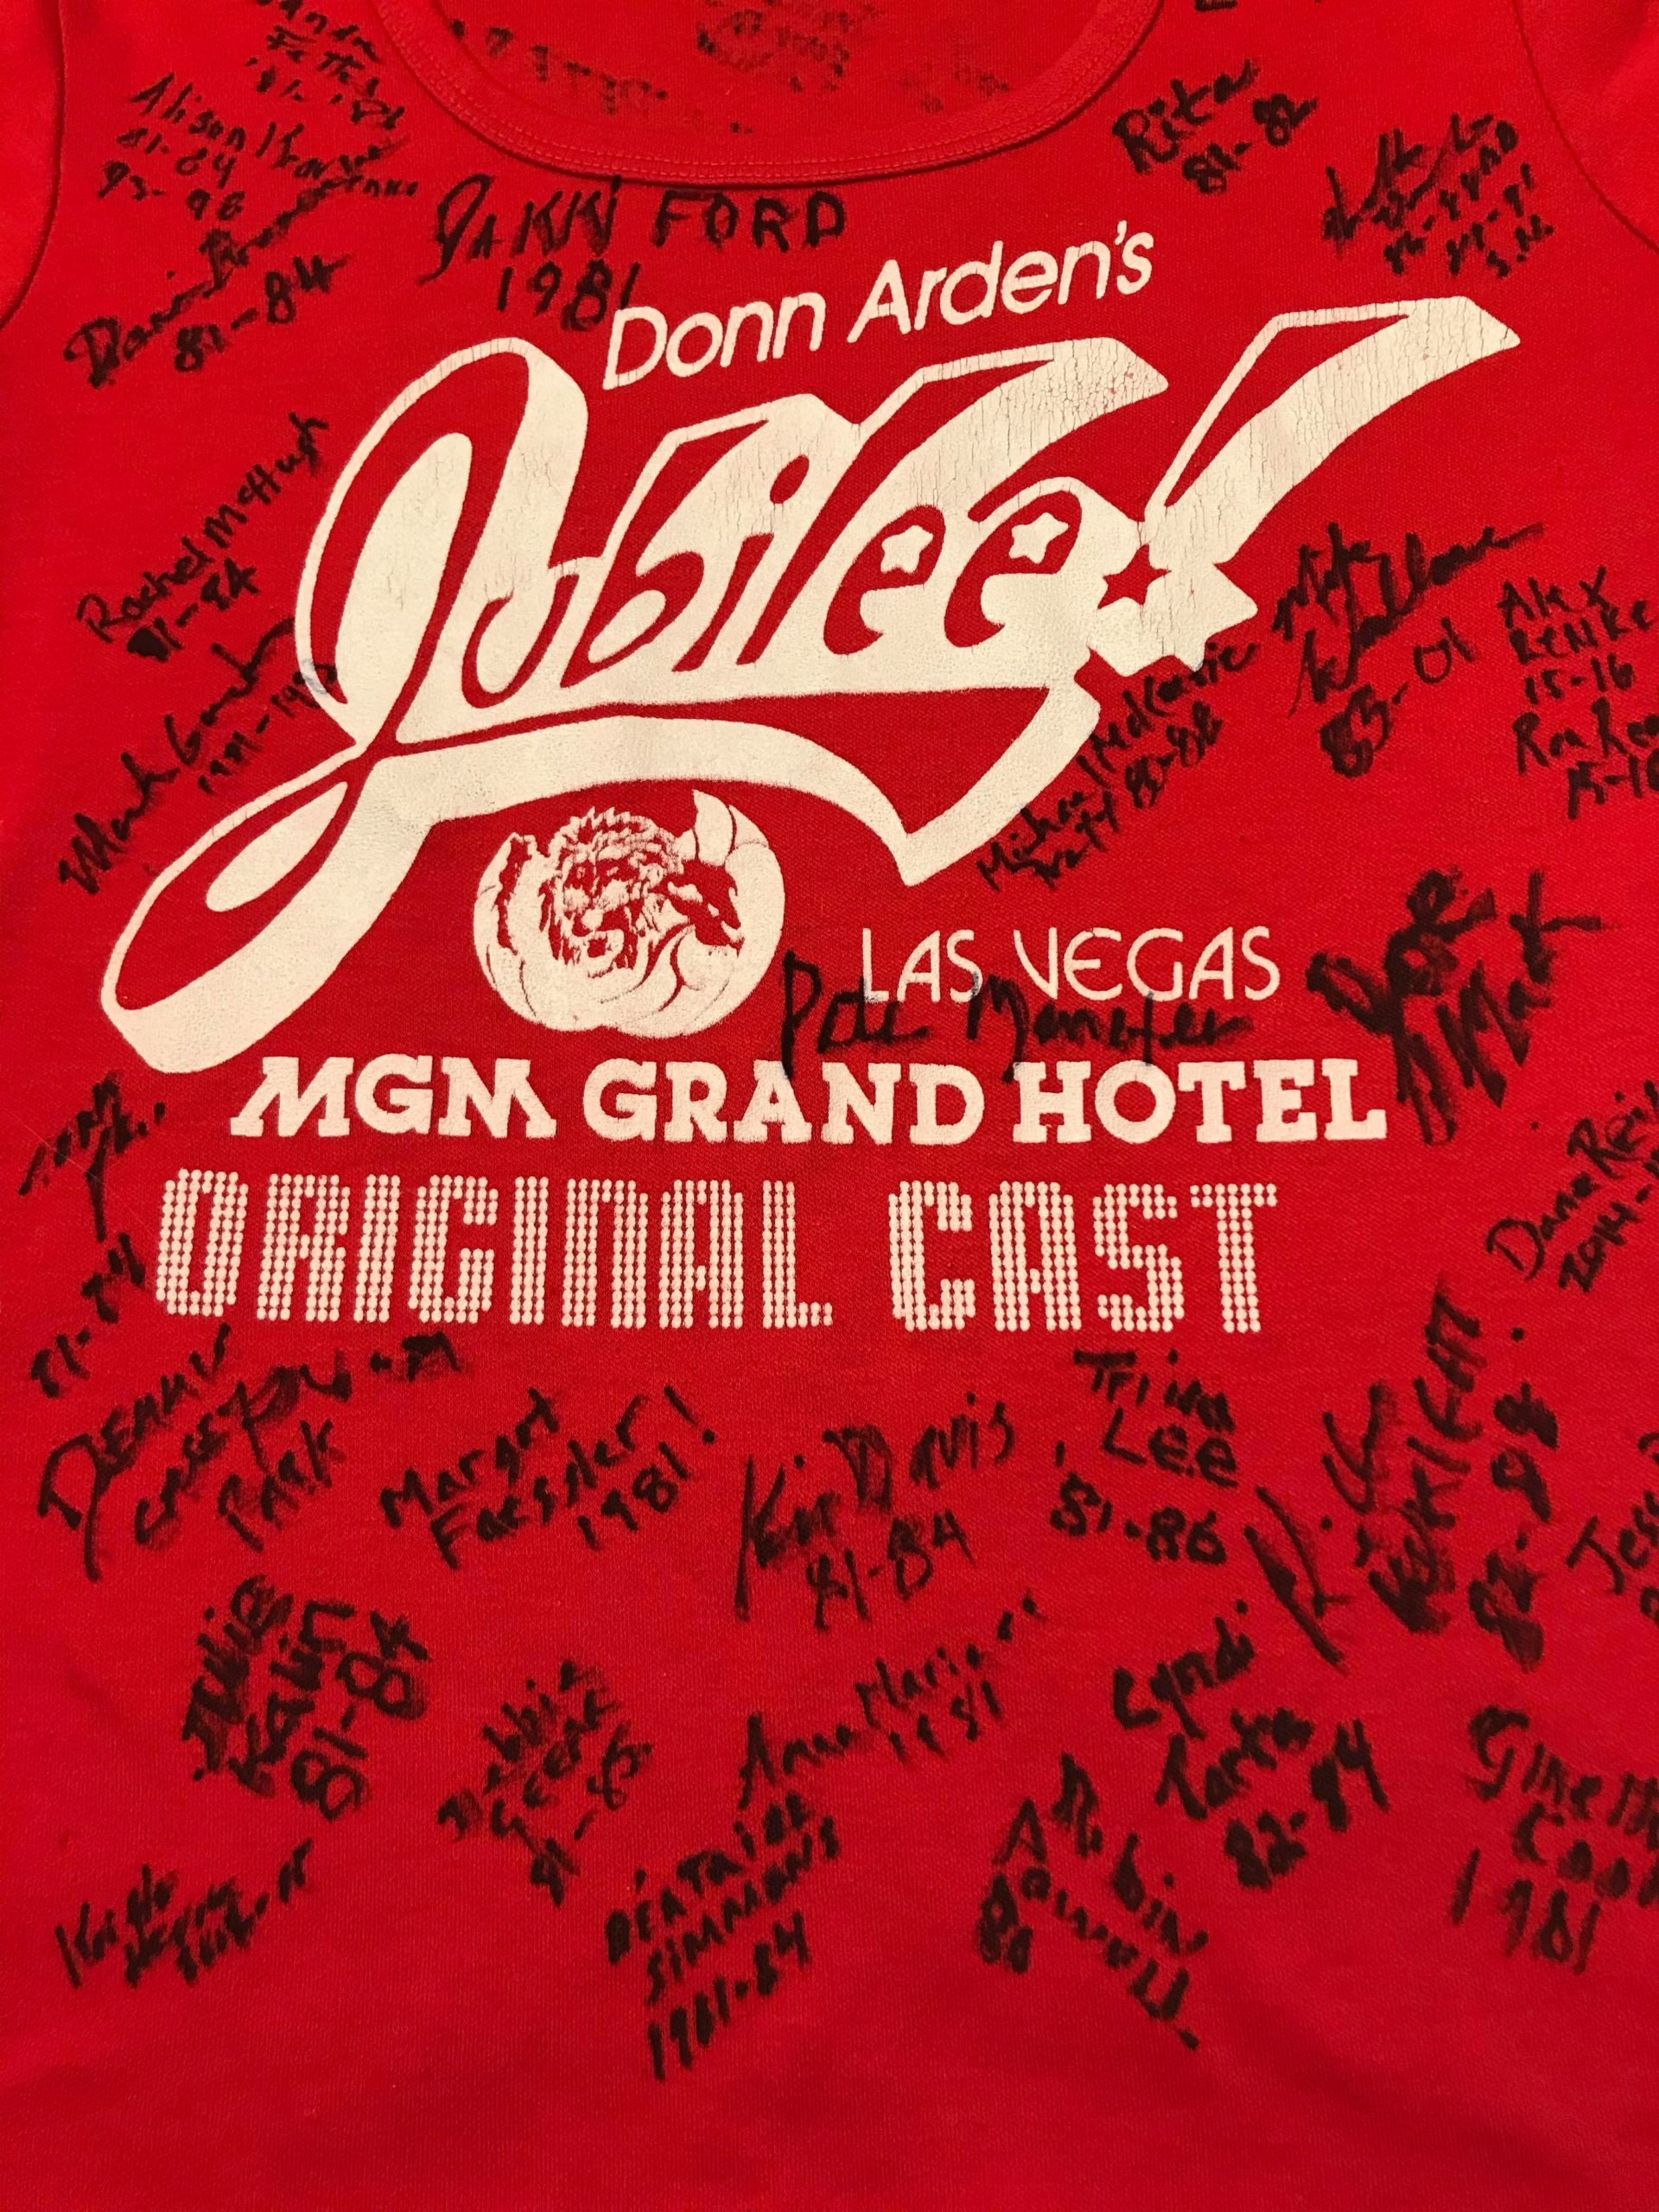 Donn Arden's Jubilee! MGM Grand Hotel Las Vegas 1981, Original Cast t-shirt, courtesy of Rita Pardue